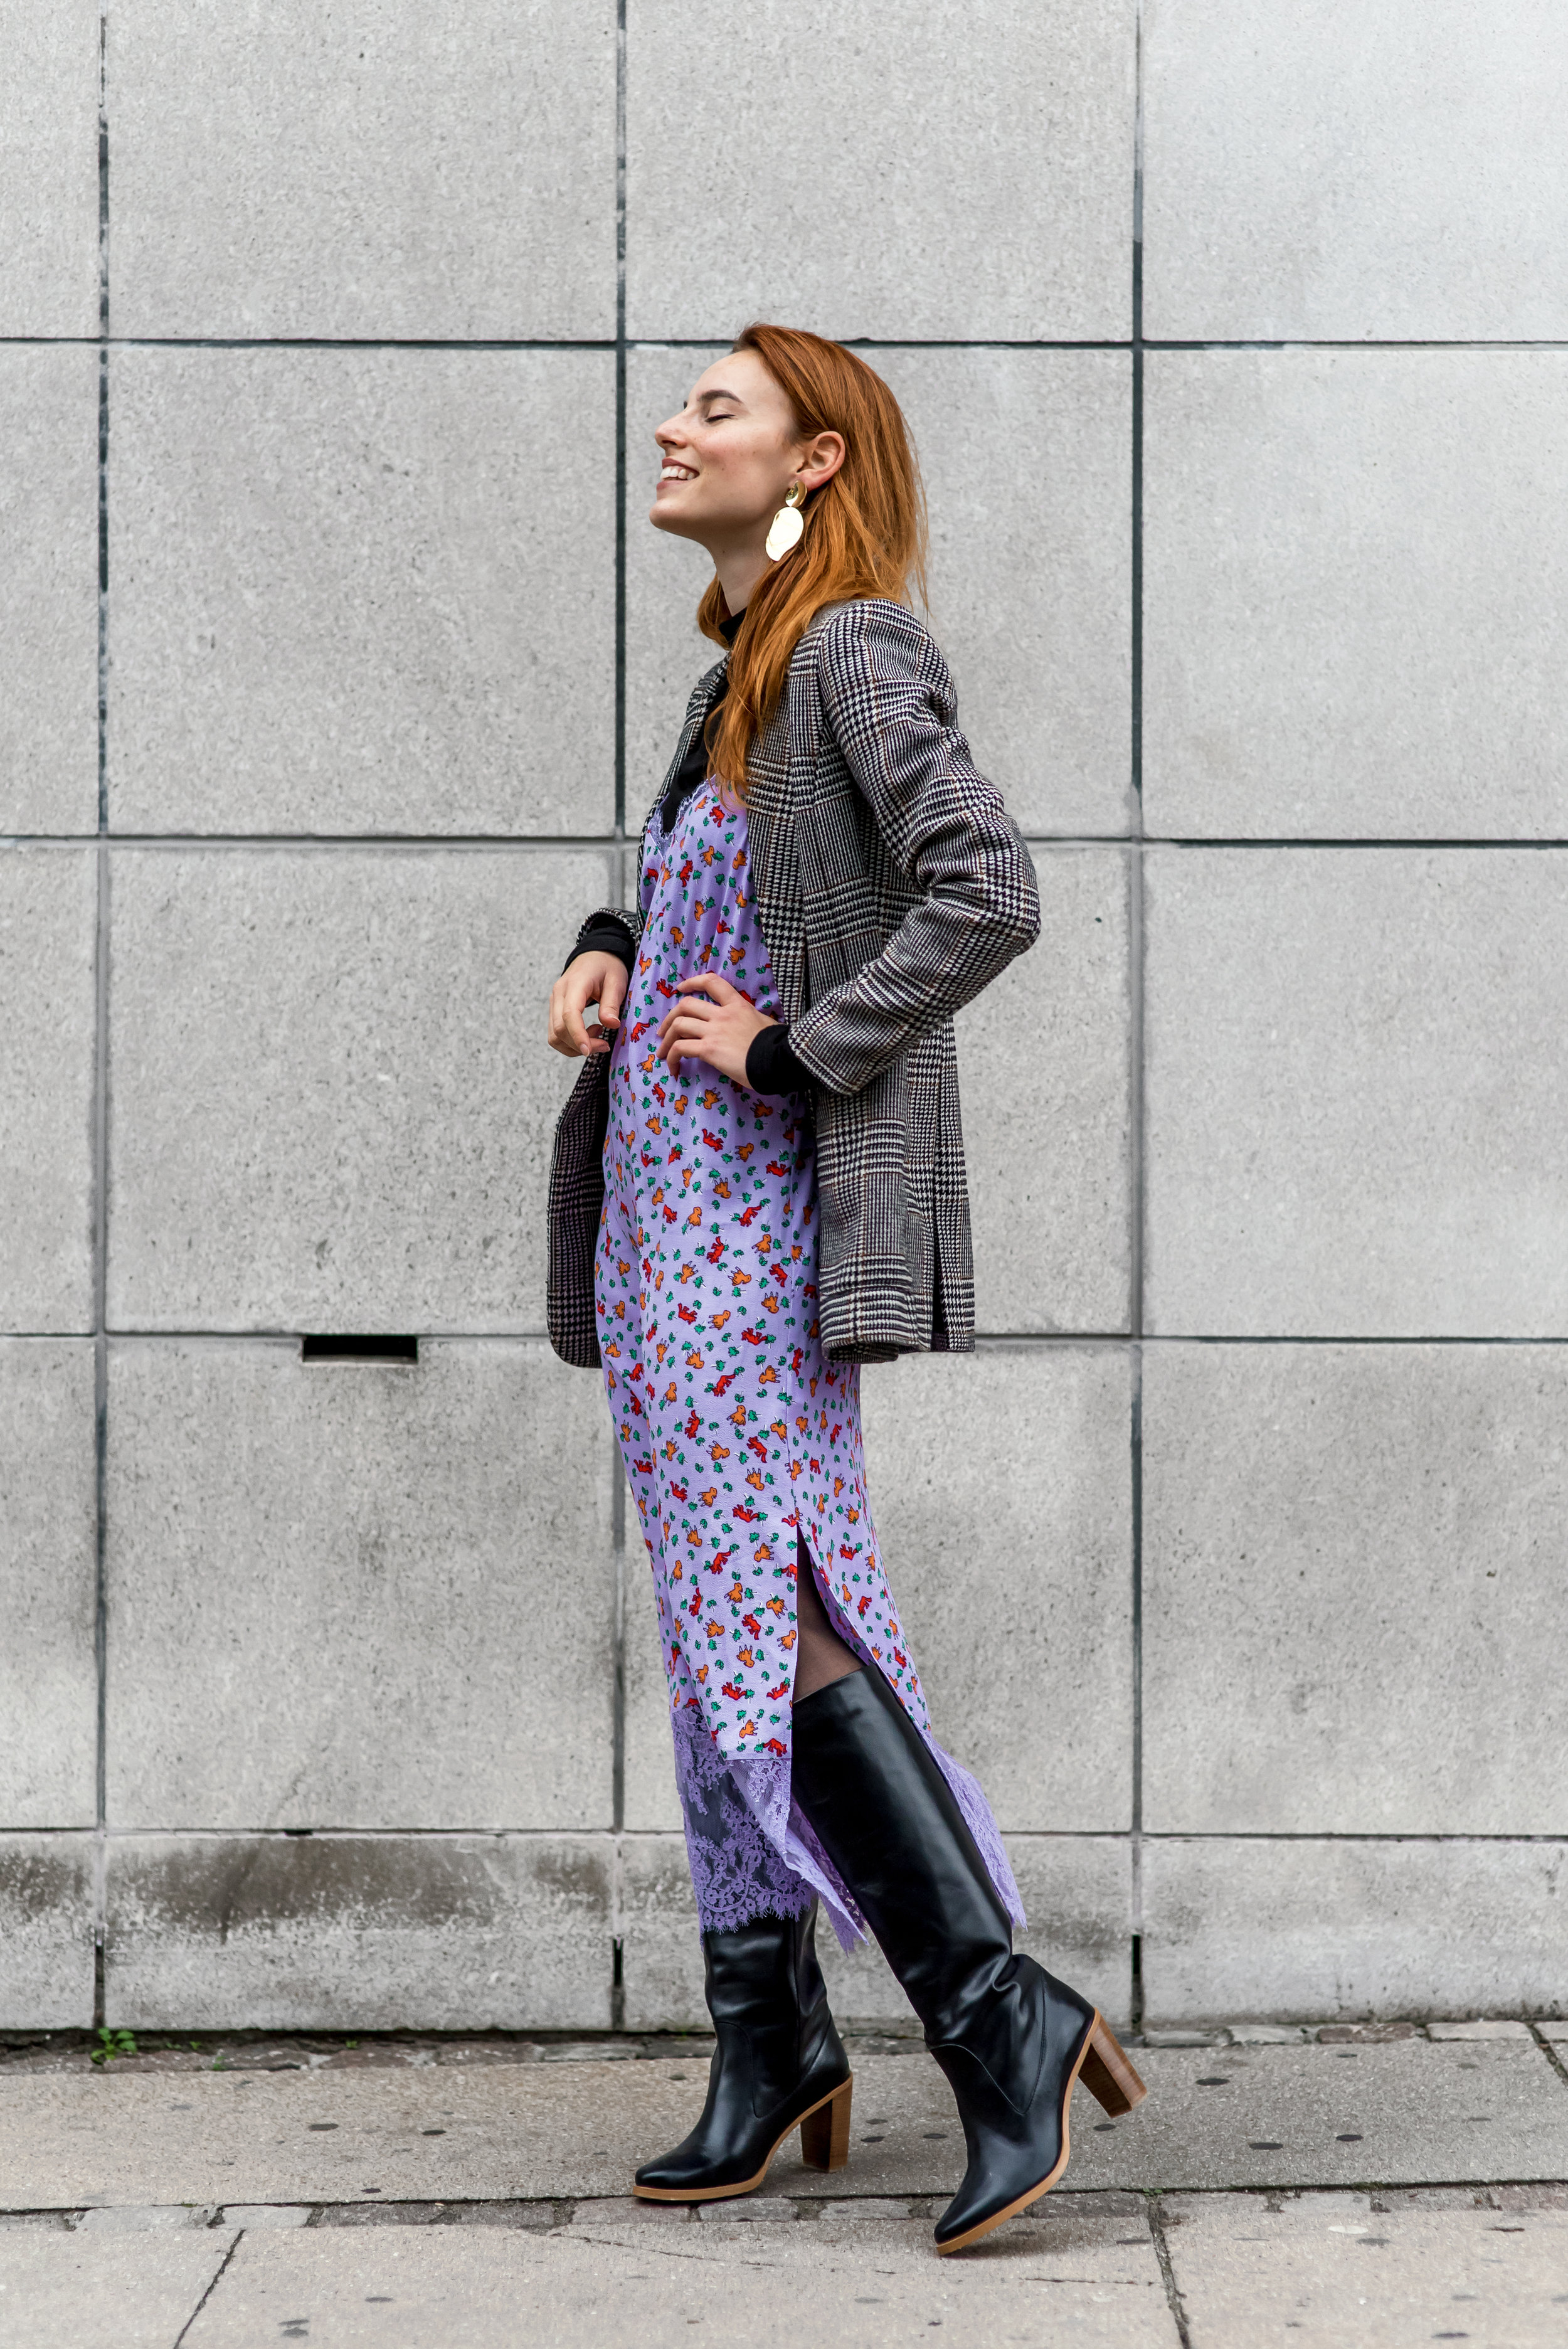 H&M blazer // & Other Stories dress // Won Hundred boots